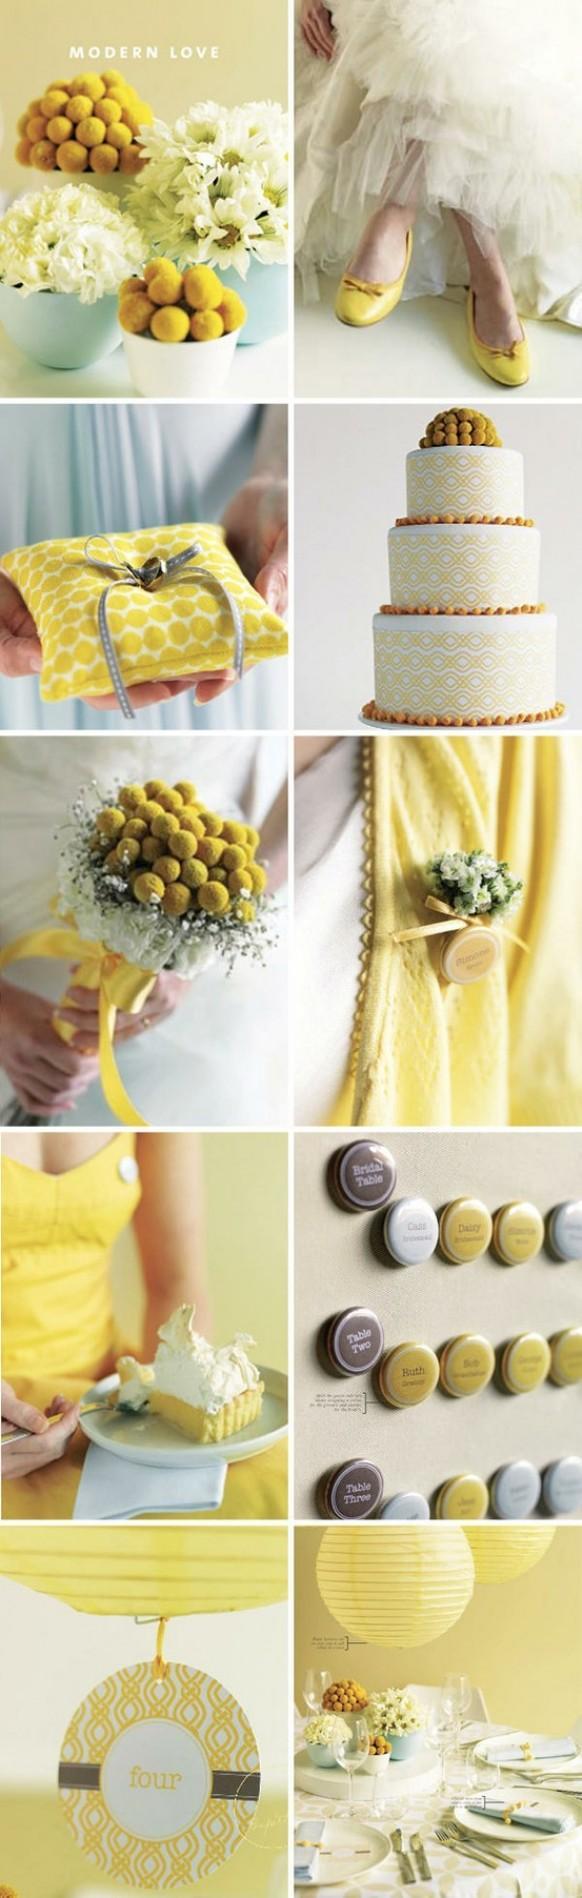 unusual wedding themes